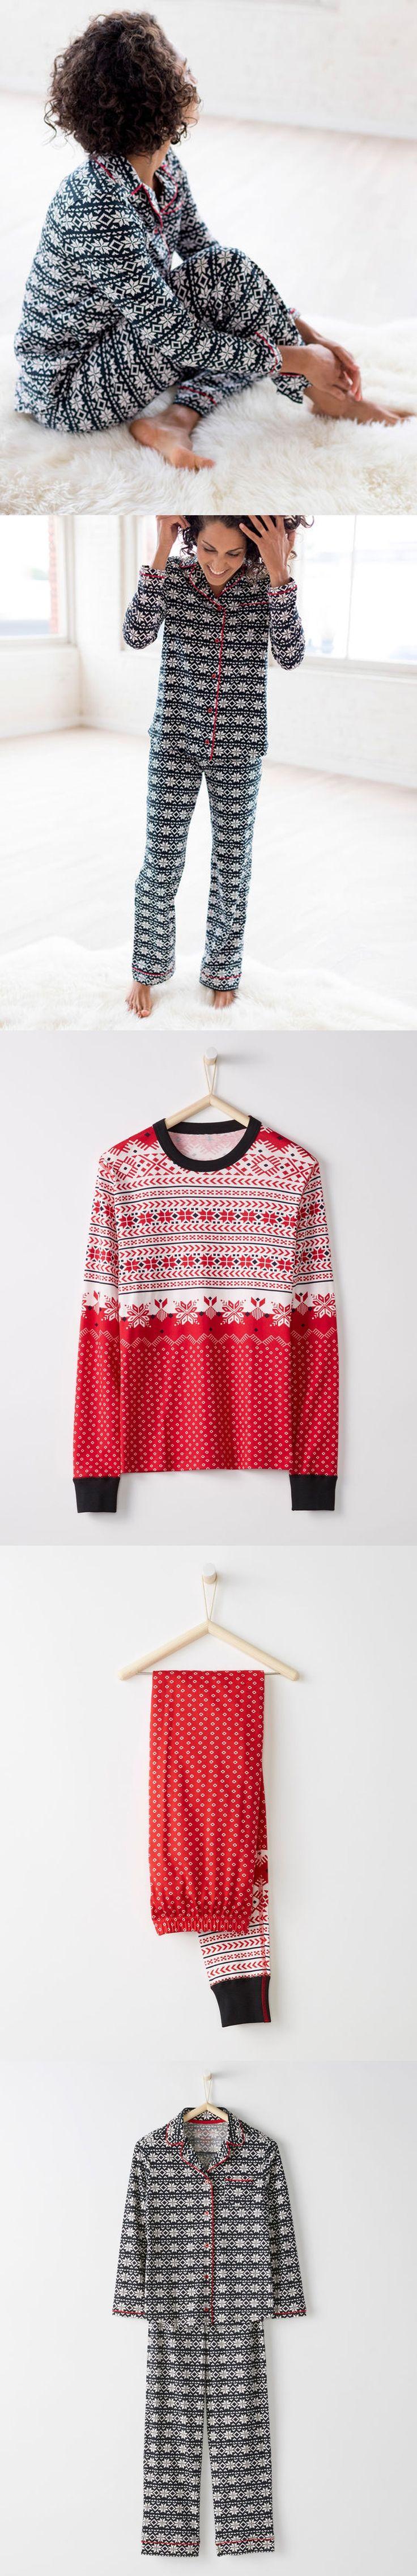 Adult Size Christmas Pajams New Family Matching Christmas Pajamas Sleepwear Nightwear Clothes